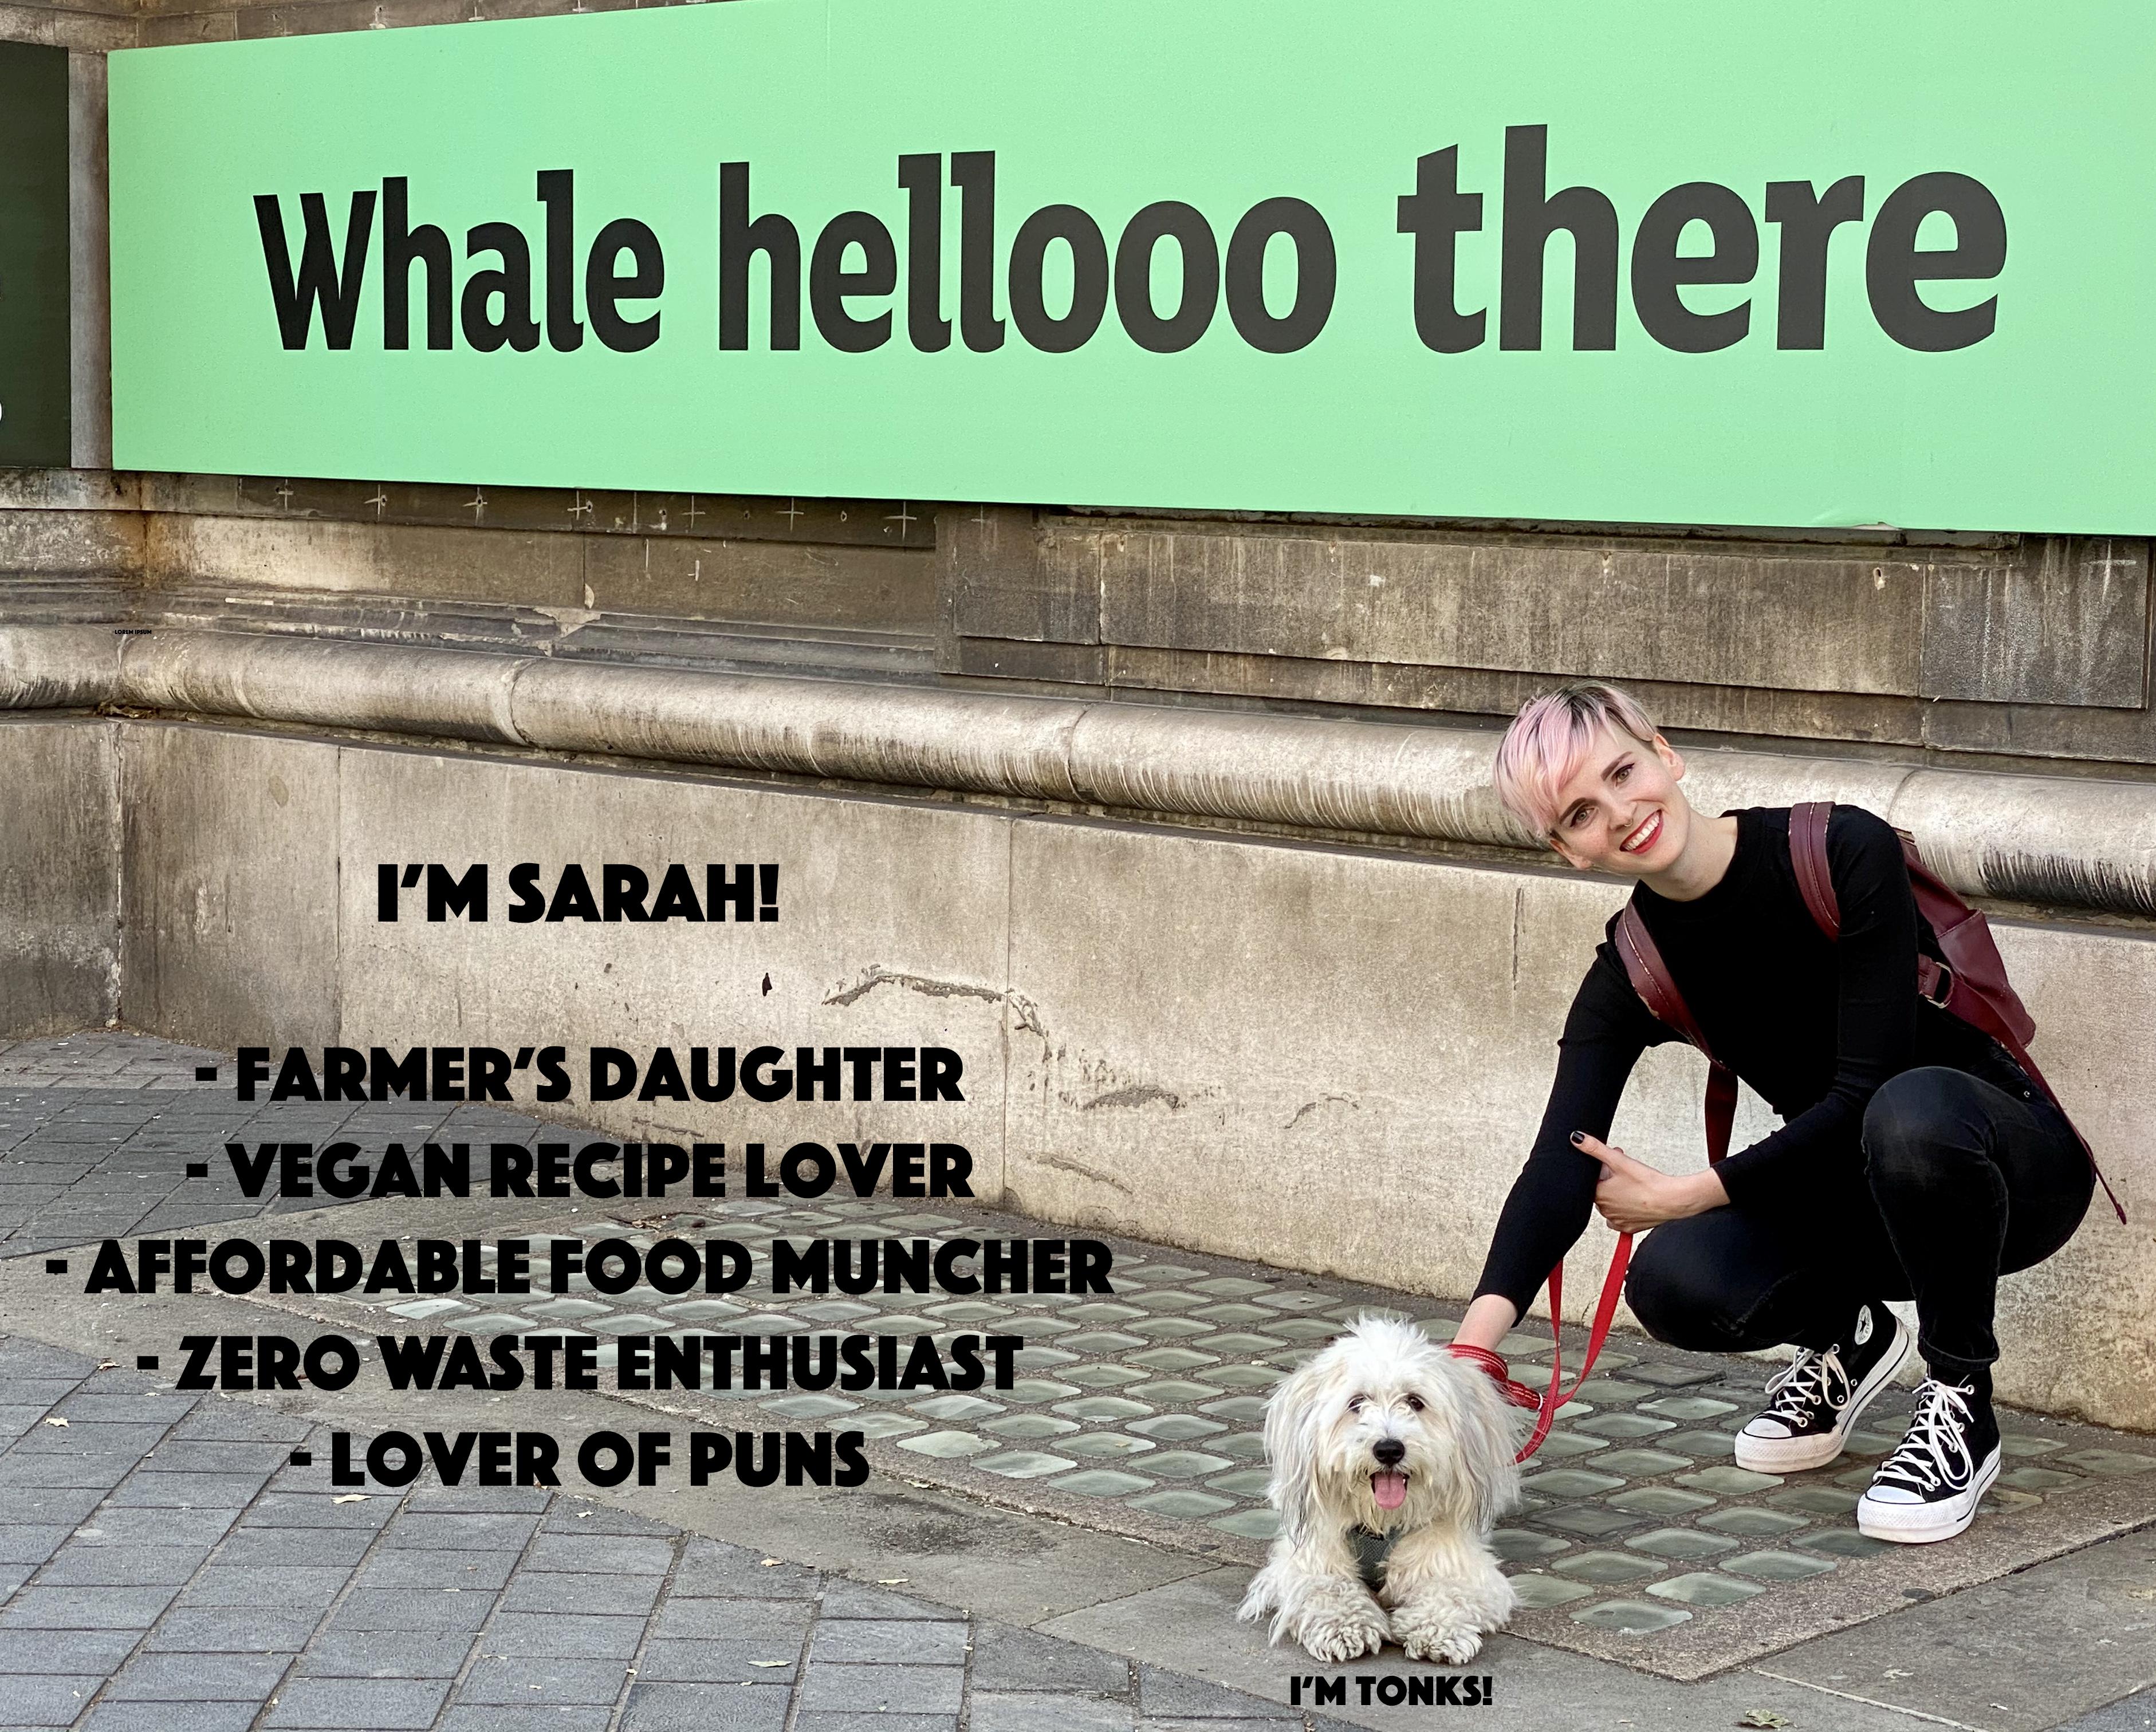 Whalehellothere